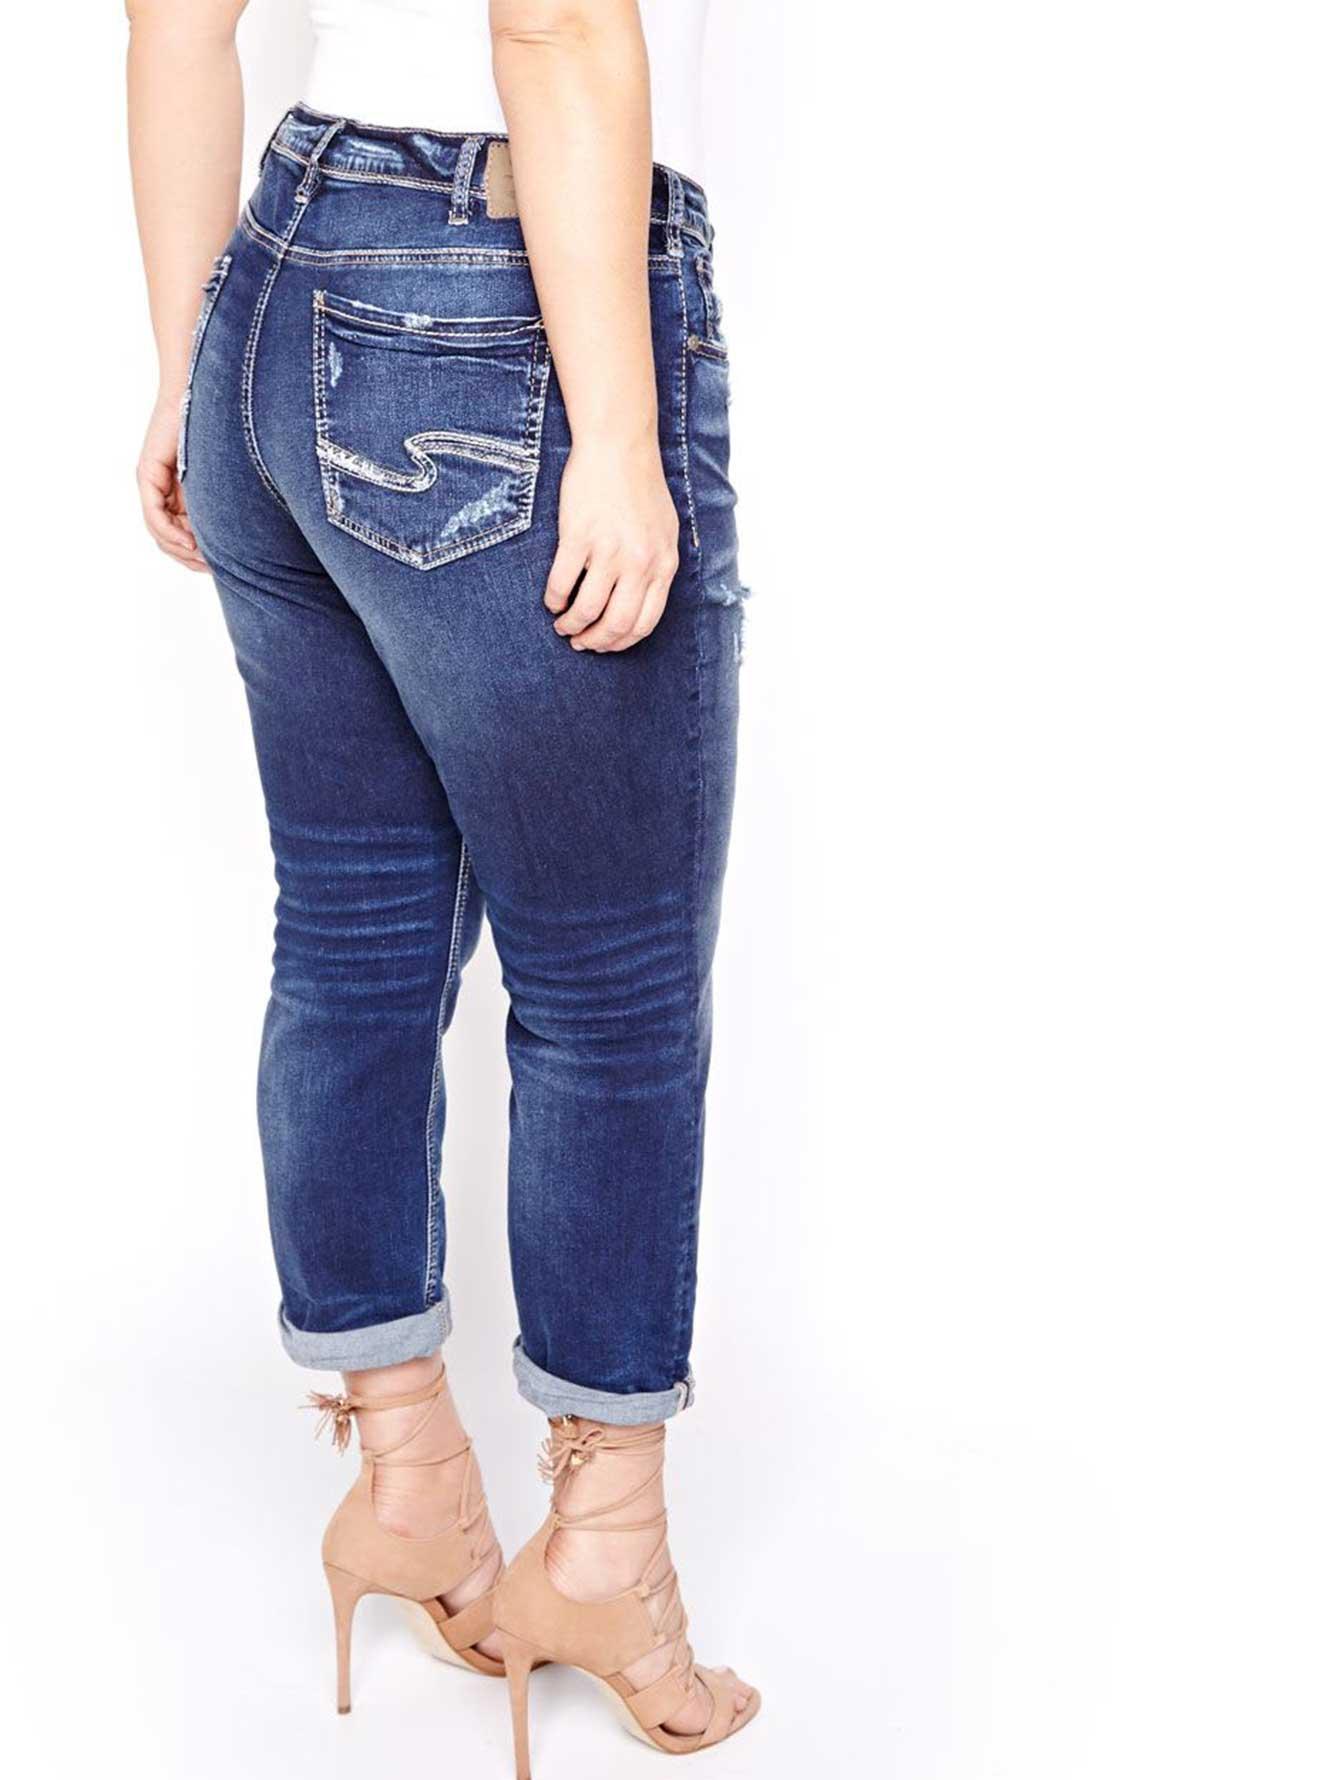 Silver Sam Boyfriend Rolled Up Jeans